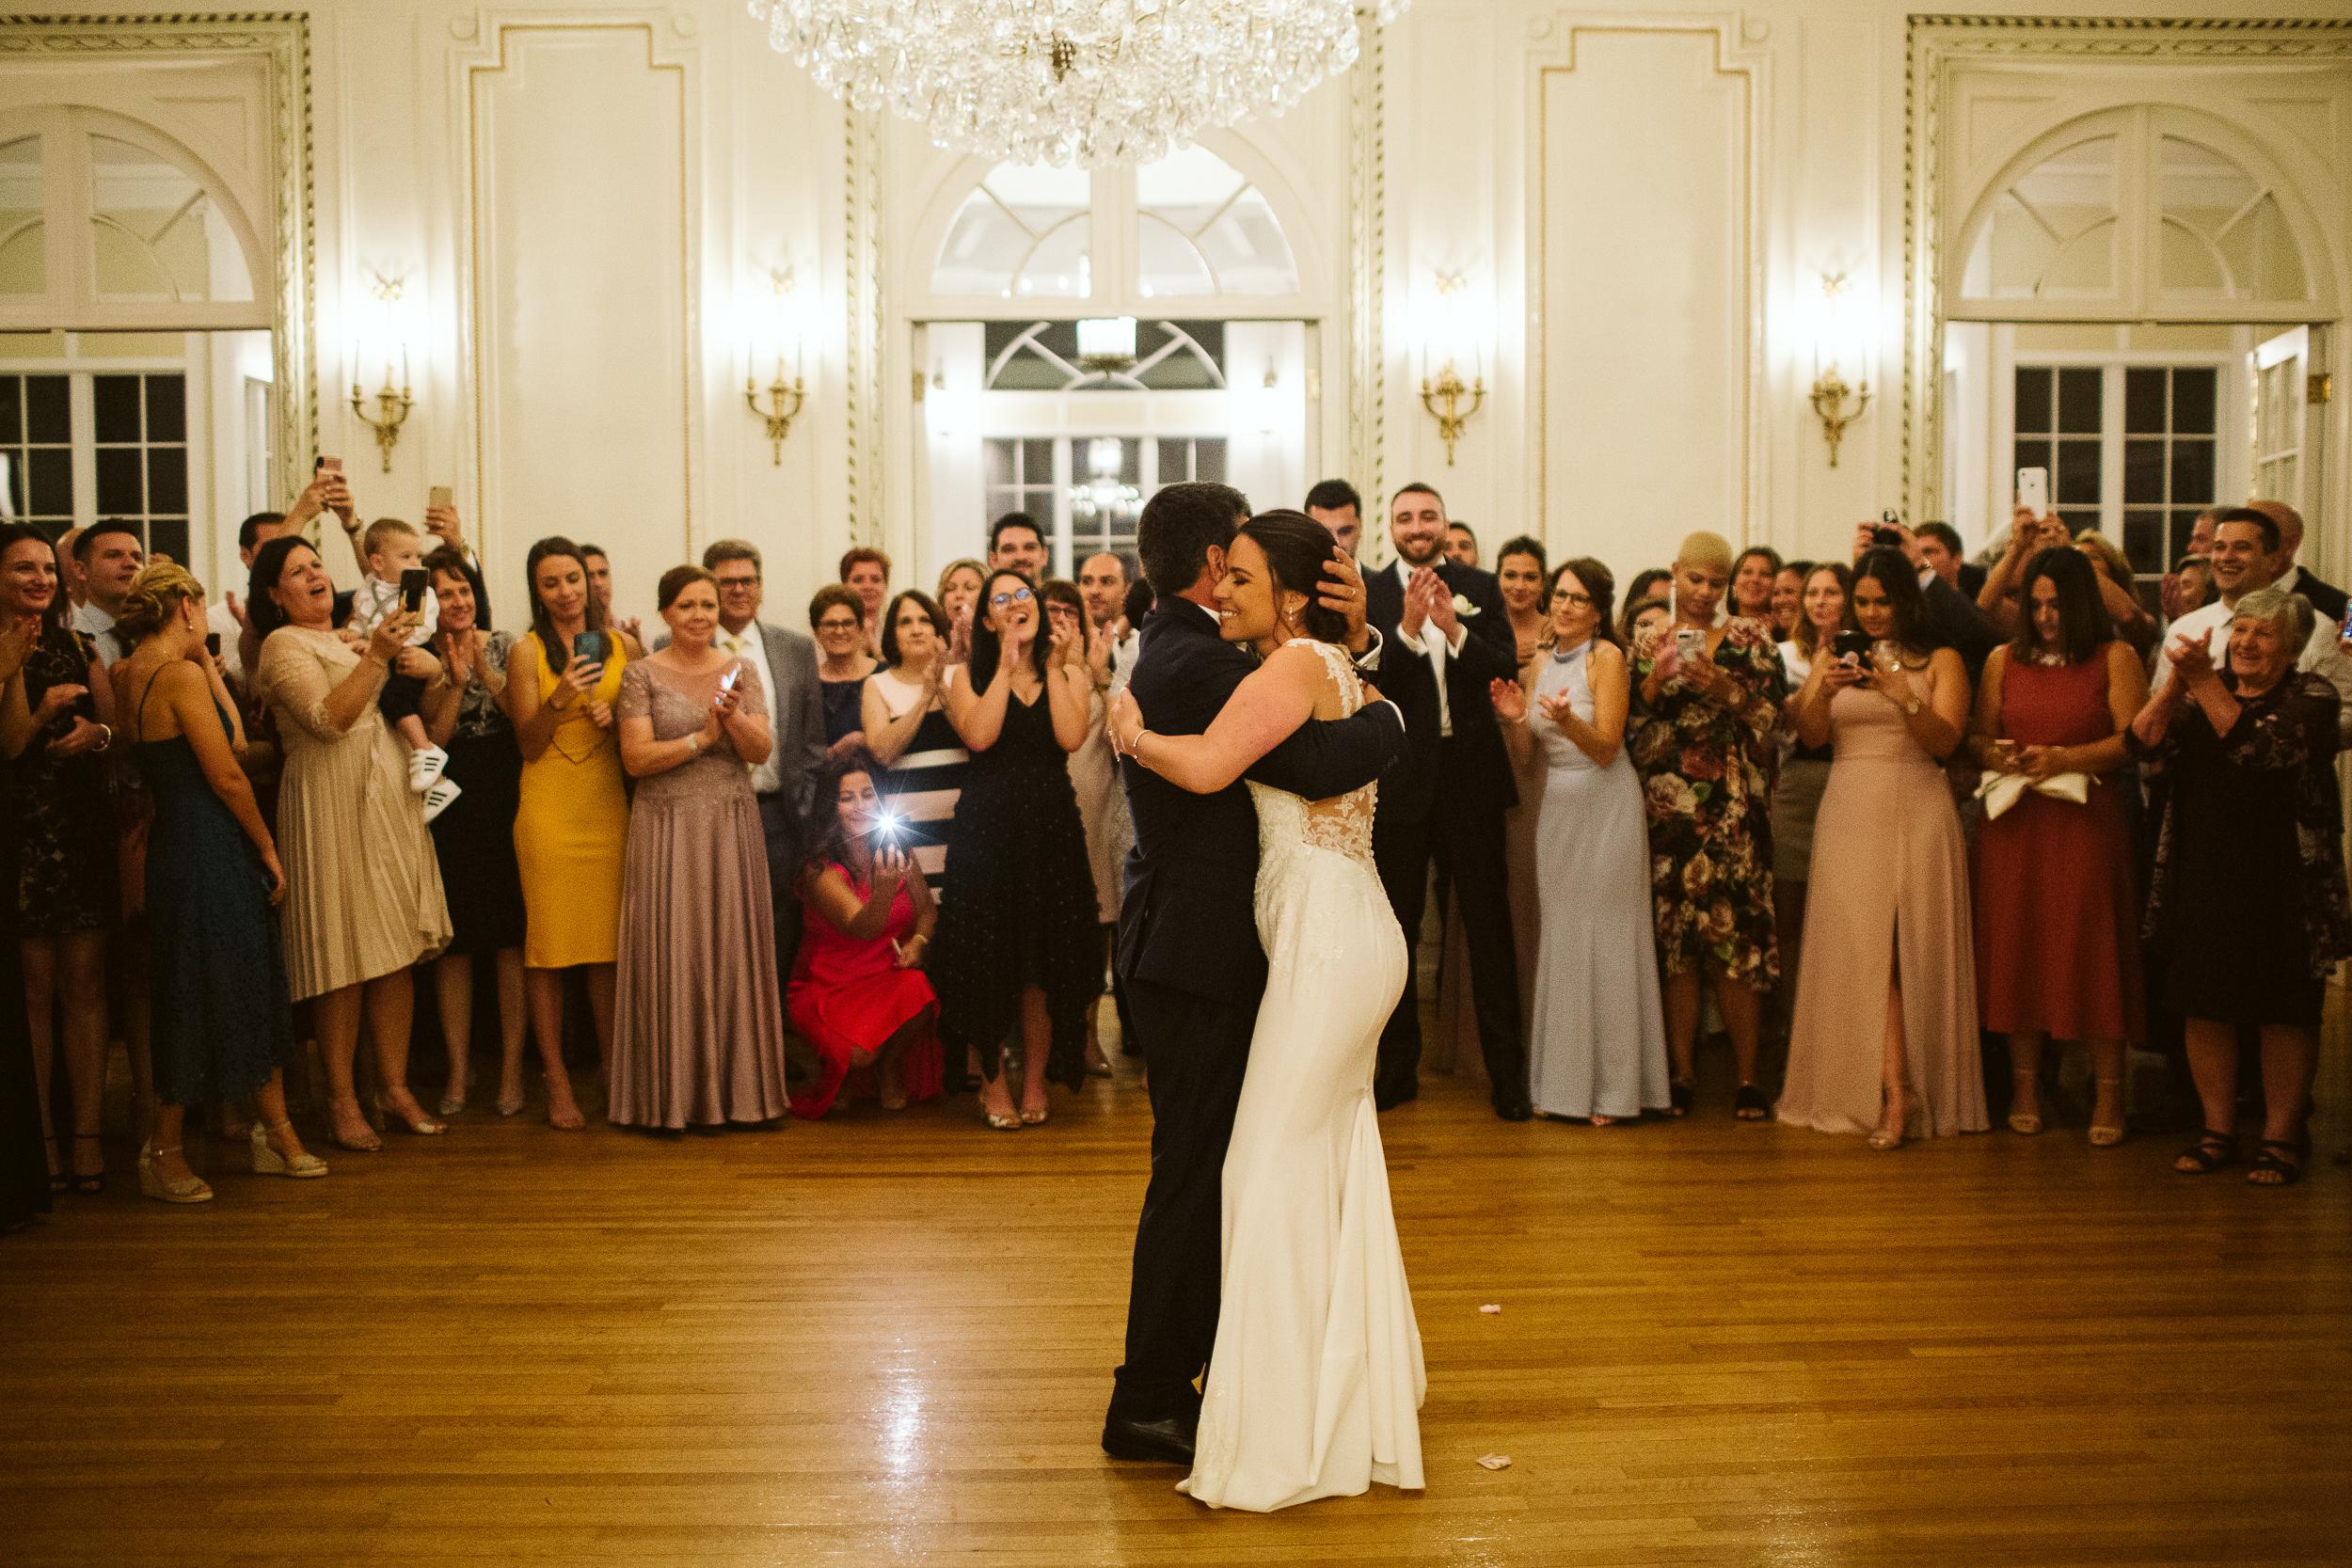 tupper-manor-wedding-photos-0032.JPG